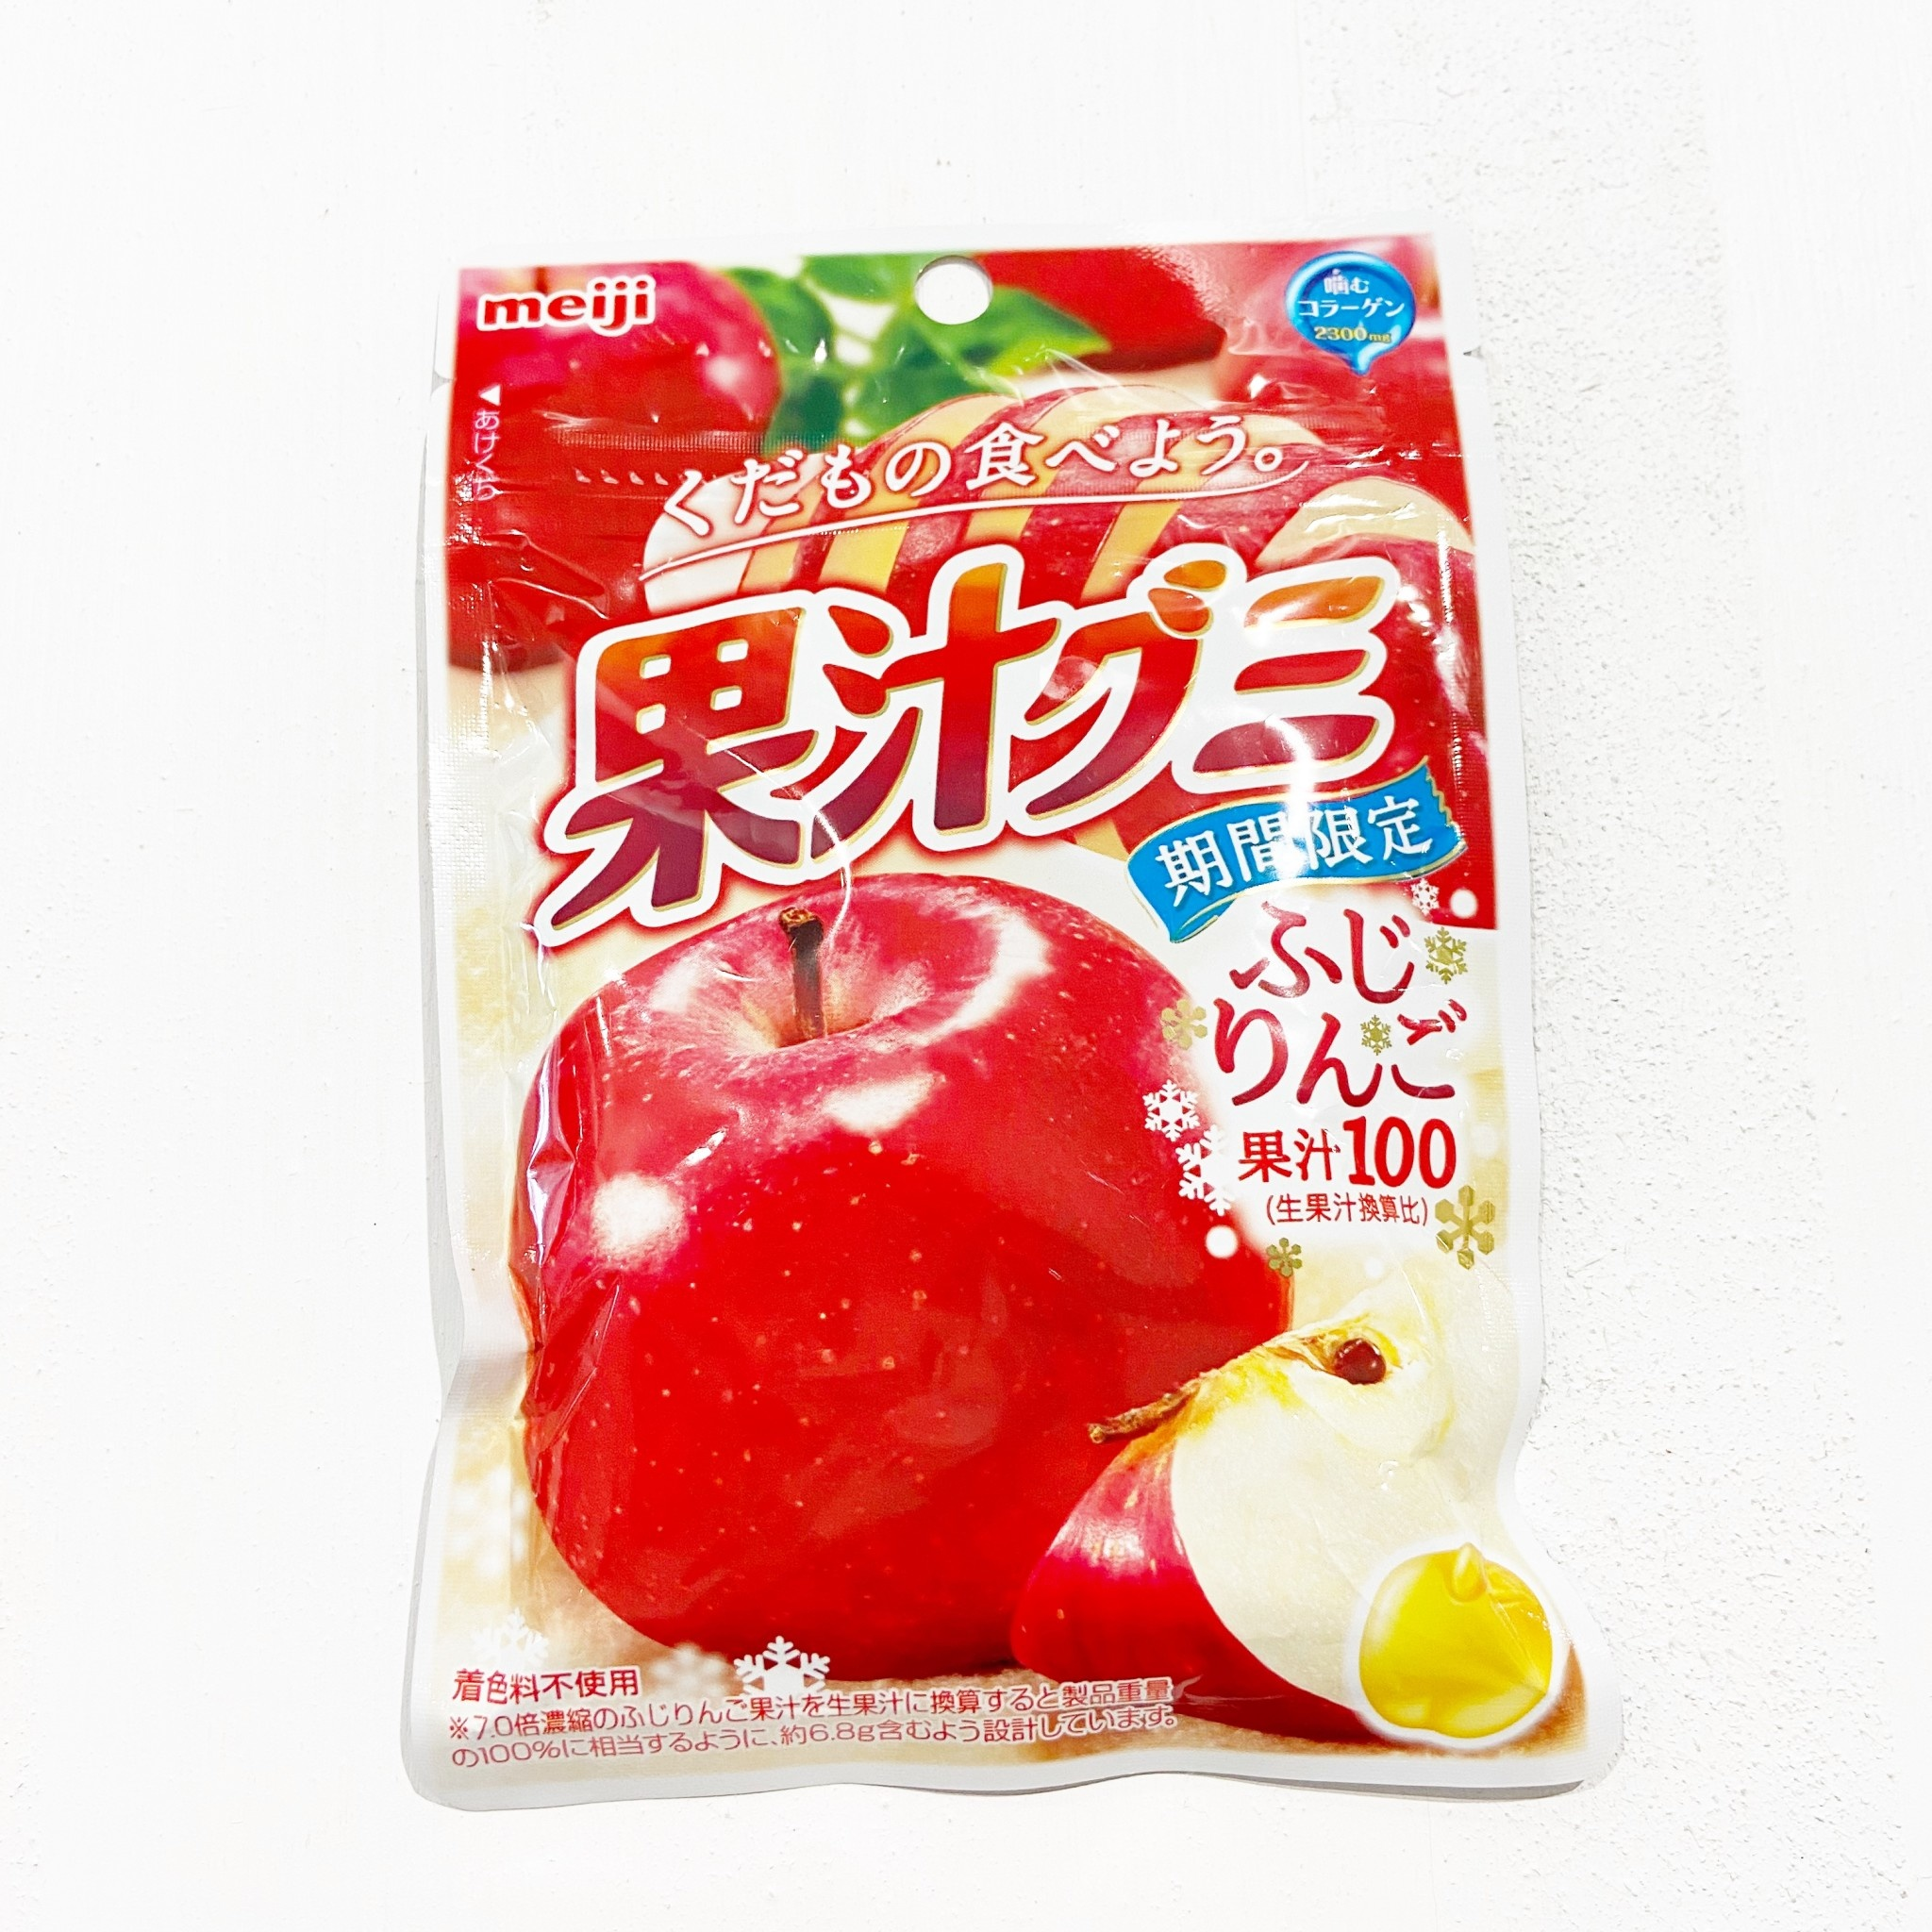 MEIJI Collagen Fruit Gummy- Apple